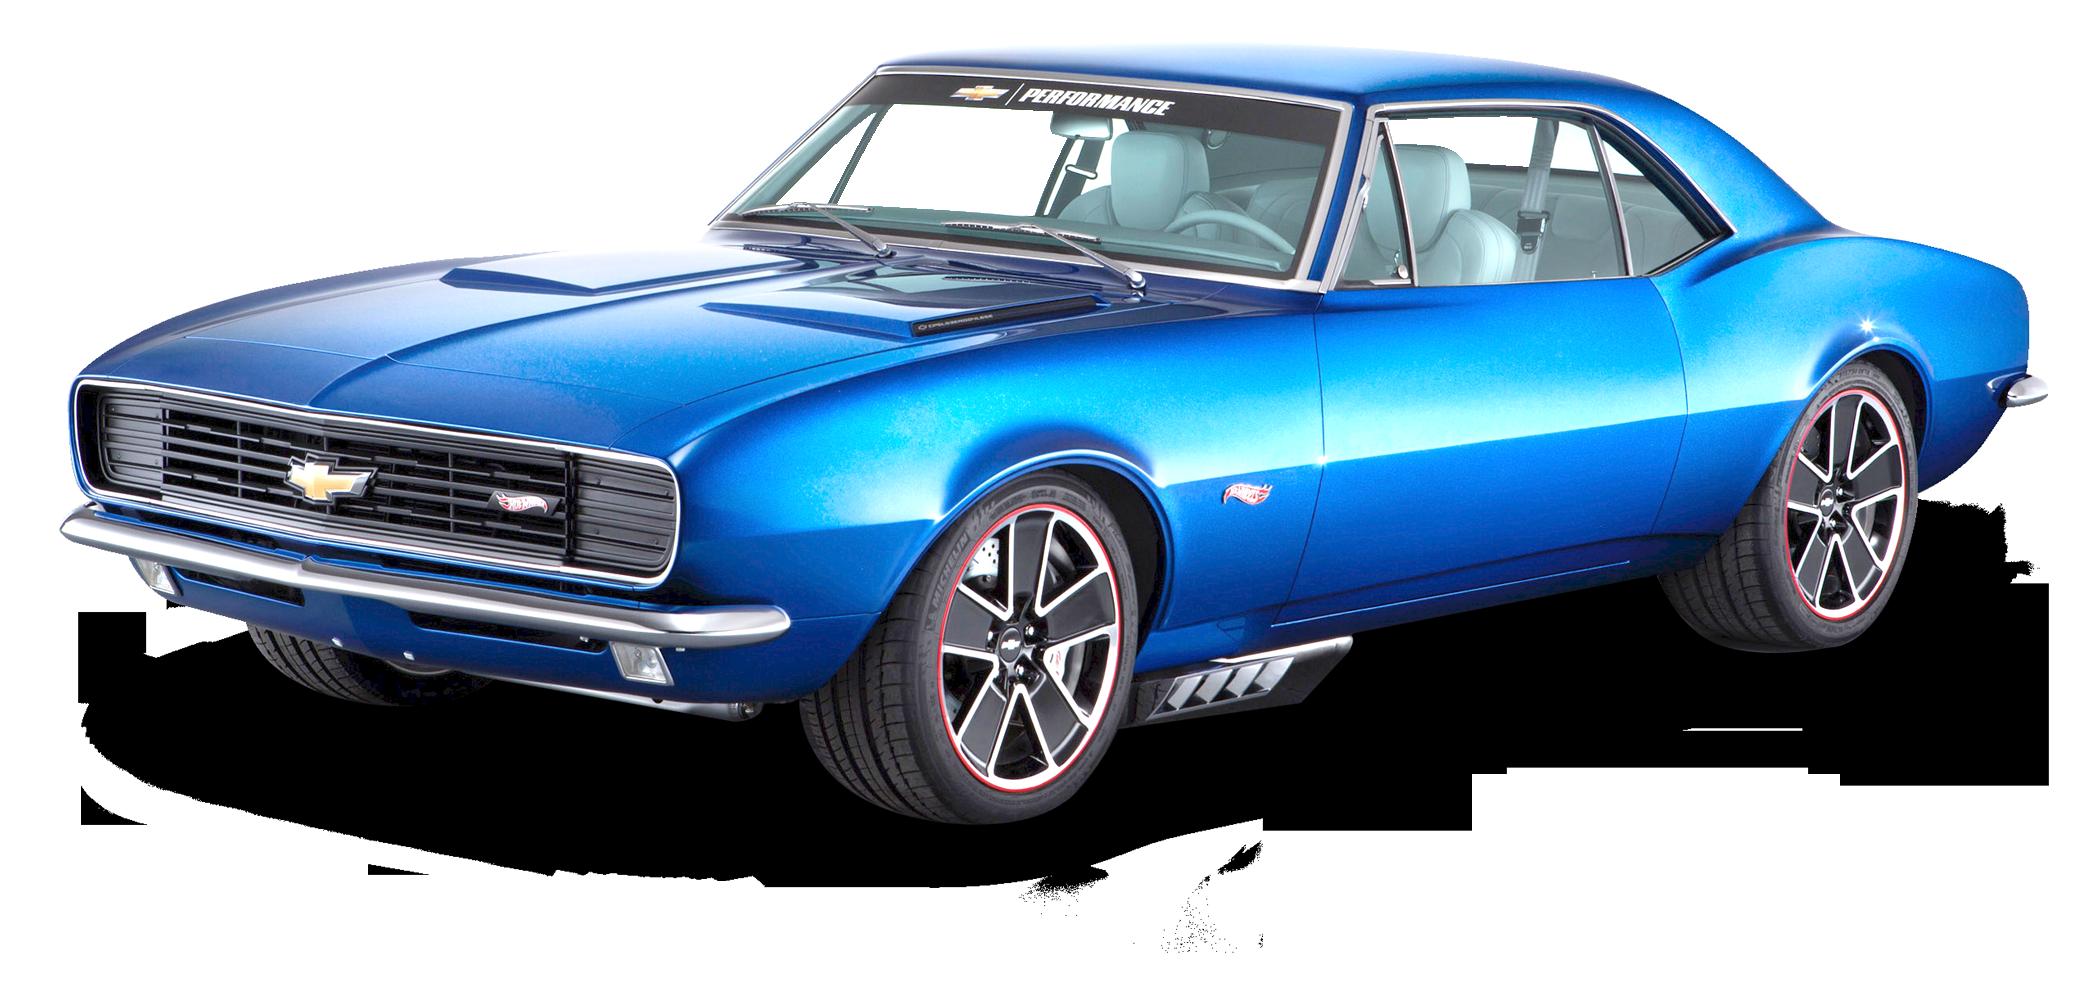 Blue Chevrolet Camaro Car Png Image Camaro Car Chevrolet Best Classic Cars